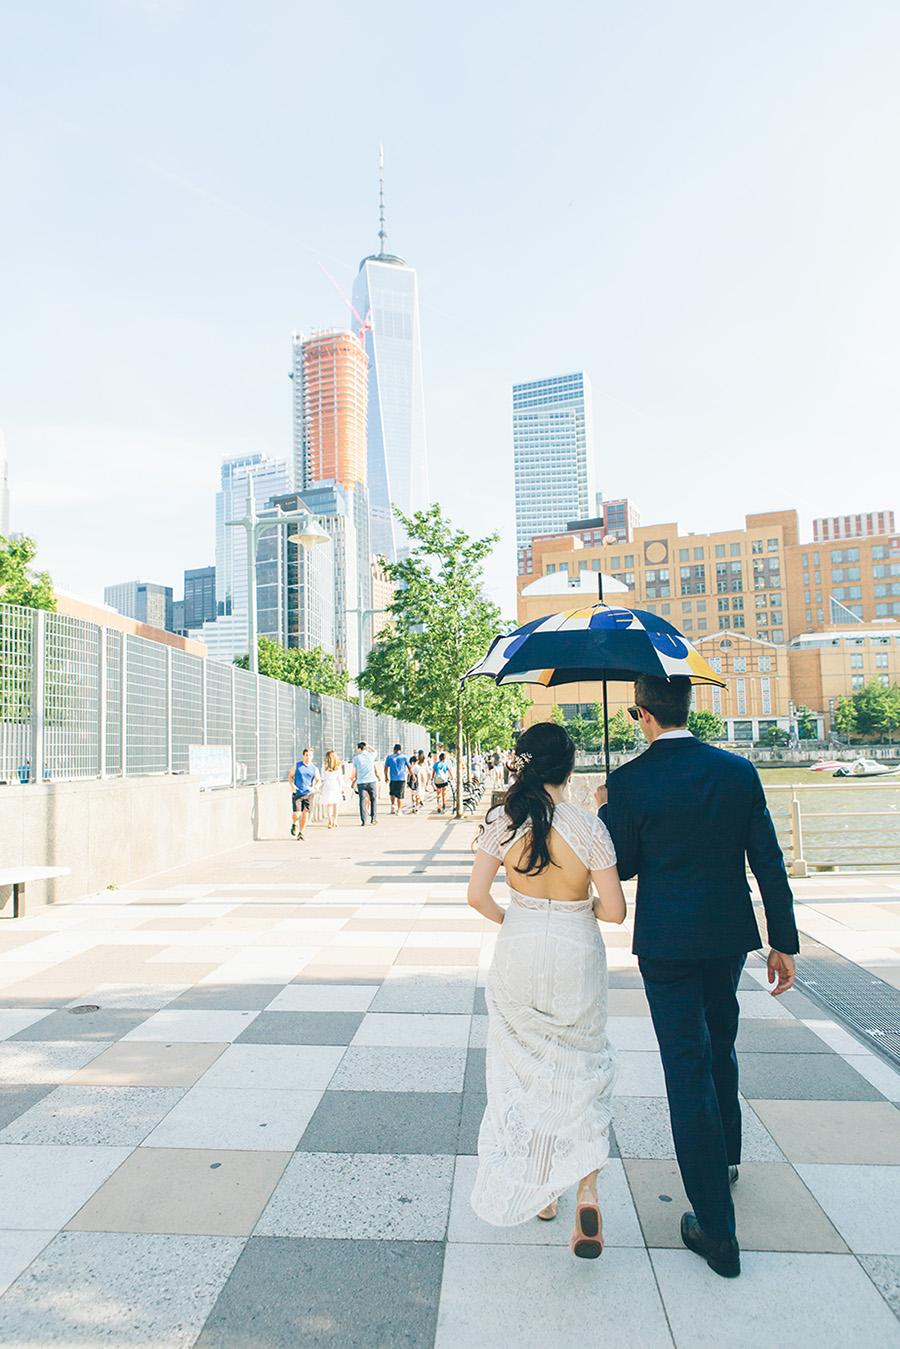 NEW-YORK-CITY-WEDDING-PHOTOGRAPHER-WEST-VILLAGE-GREENWICH-HOTEL-GRAND-BANKS-PIER-0056.jpg